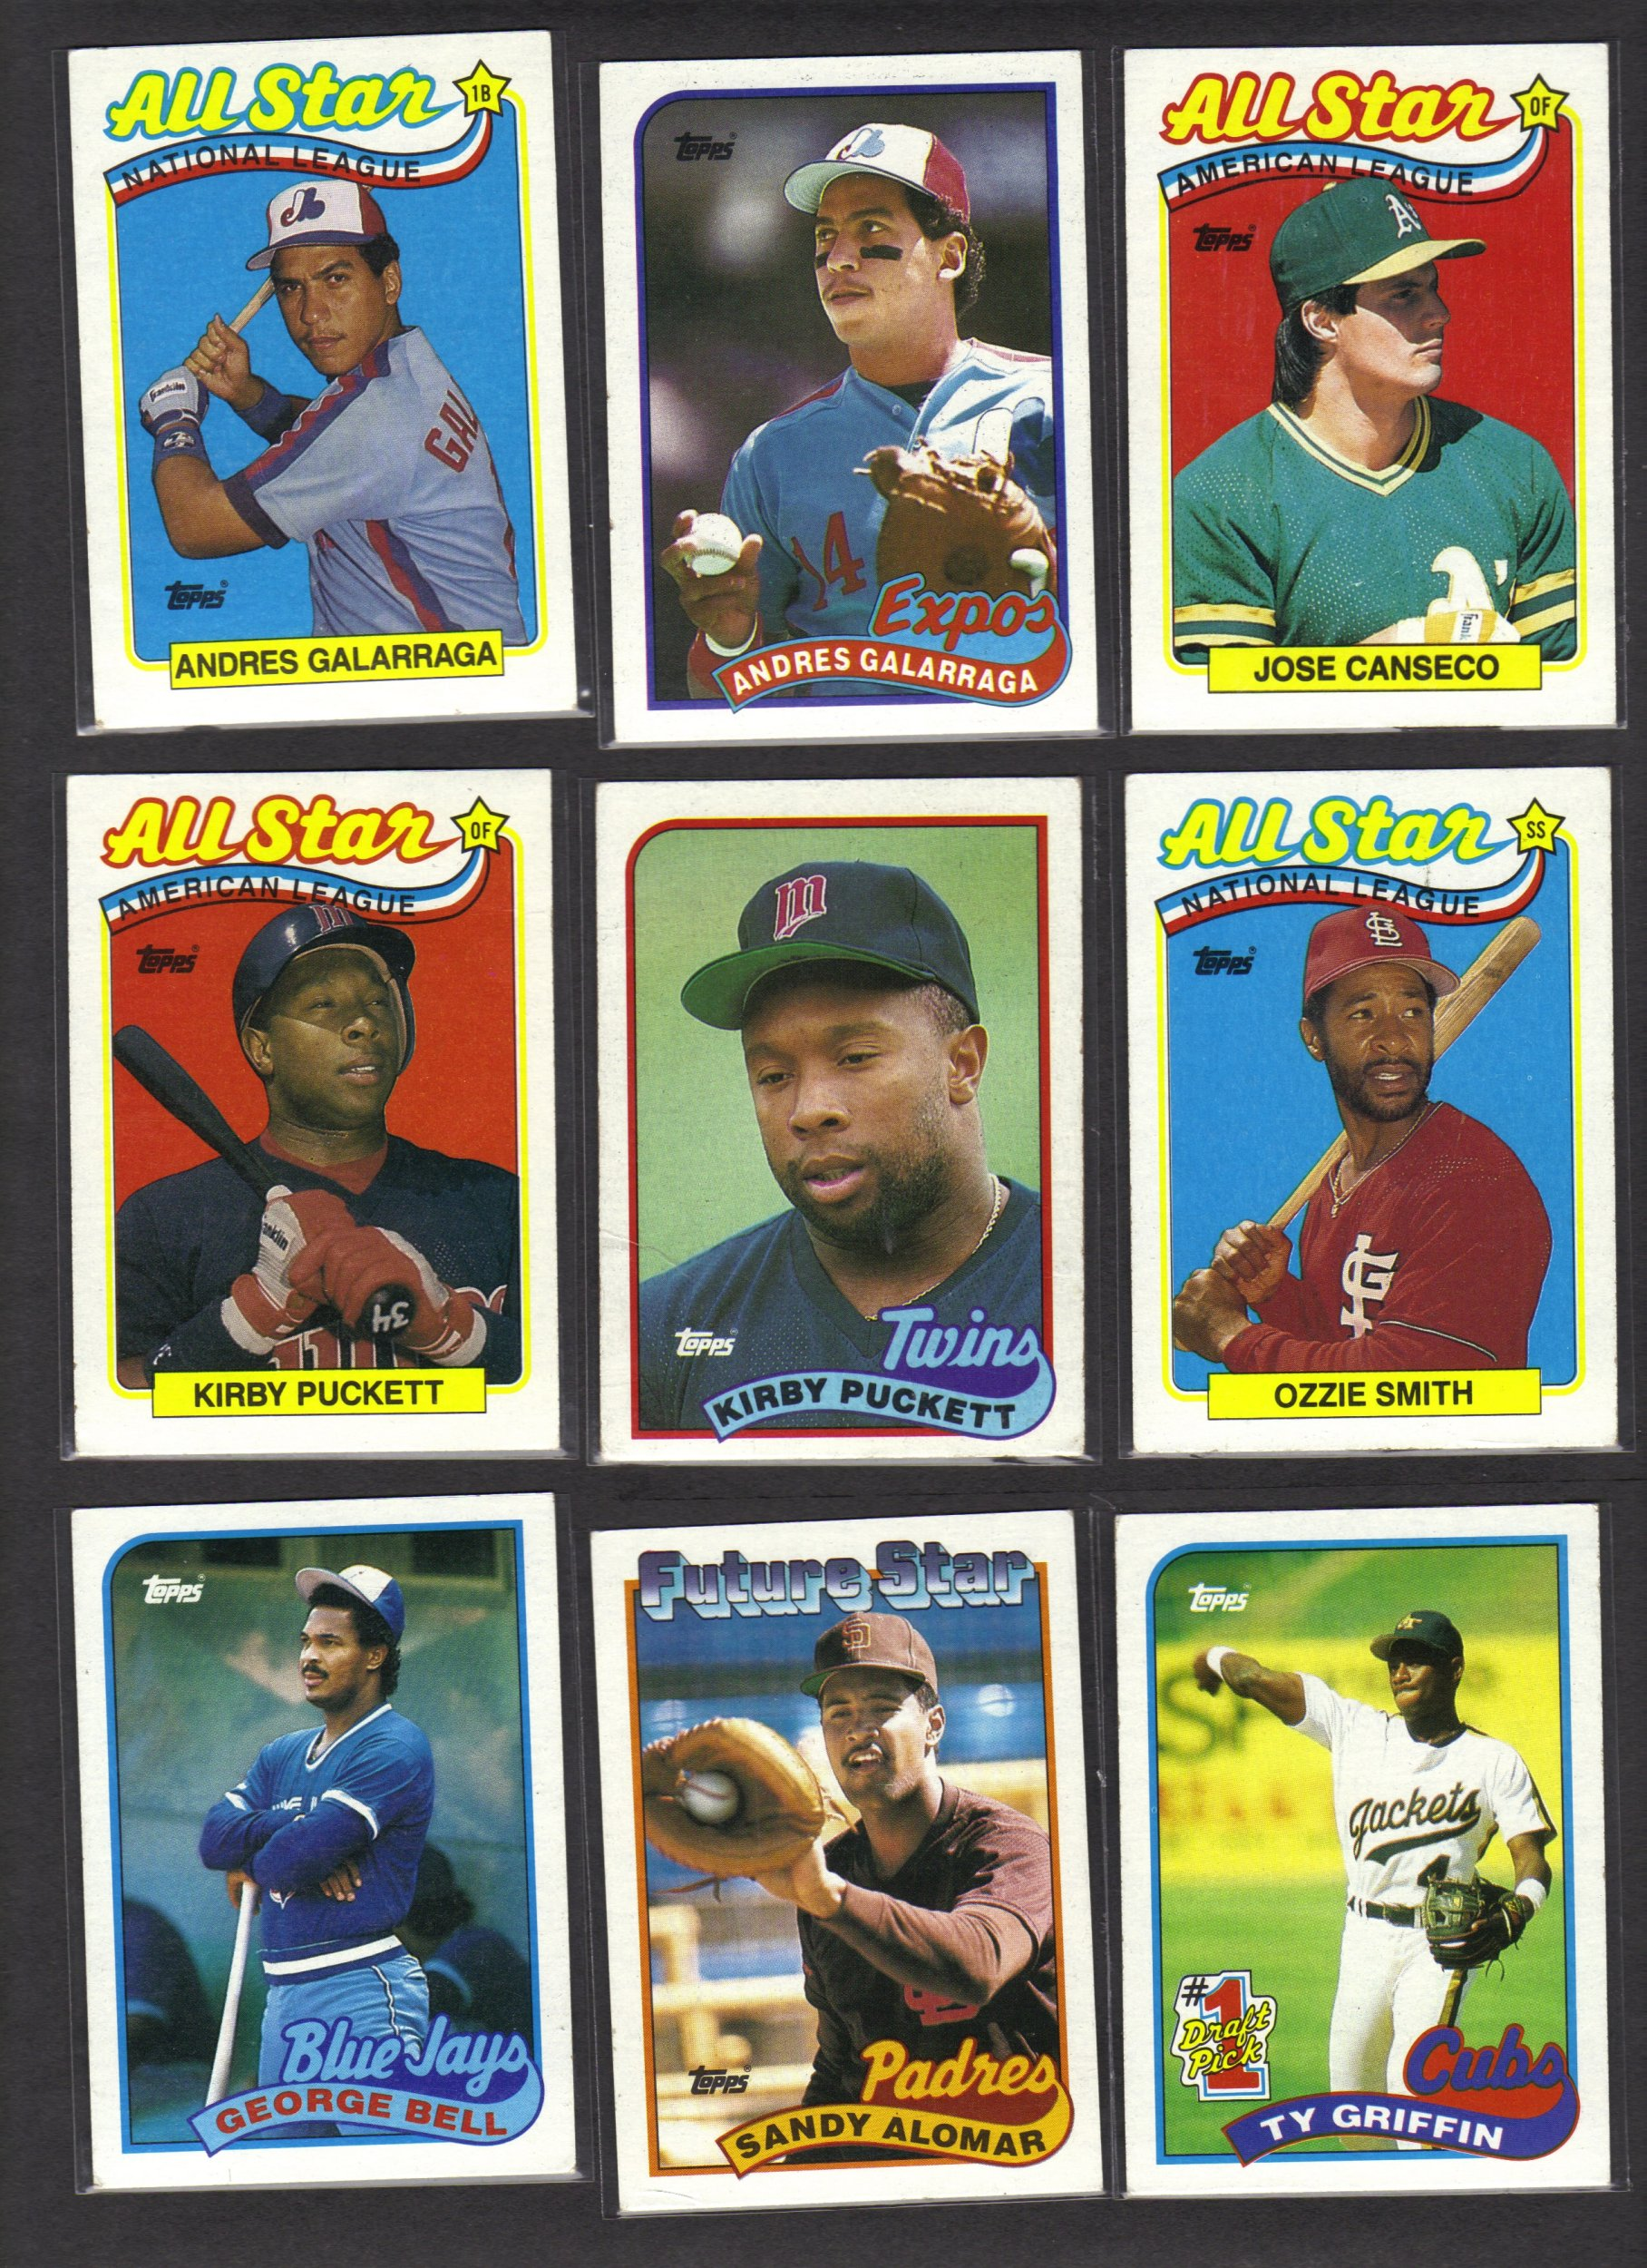 1989 Topps Baseball Cards Topps Amazoncom Books